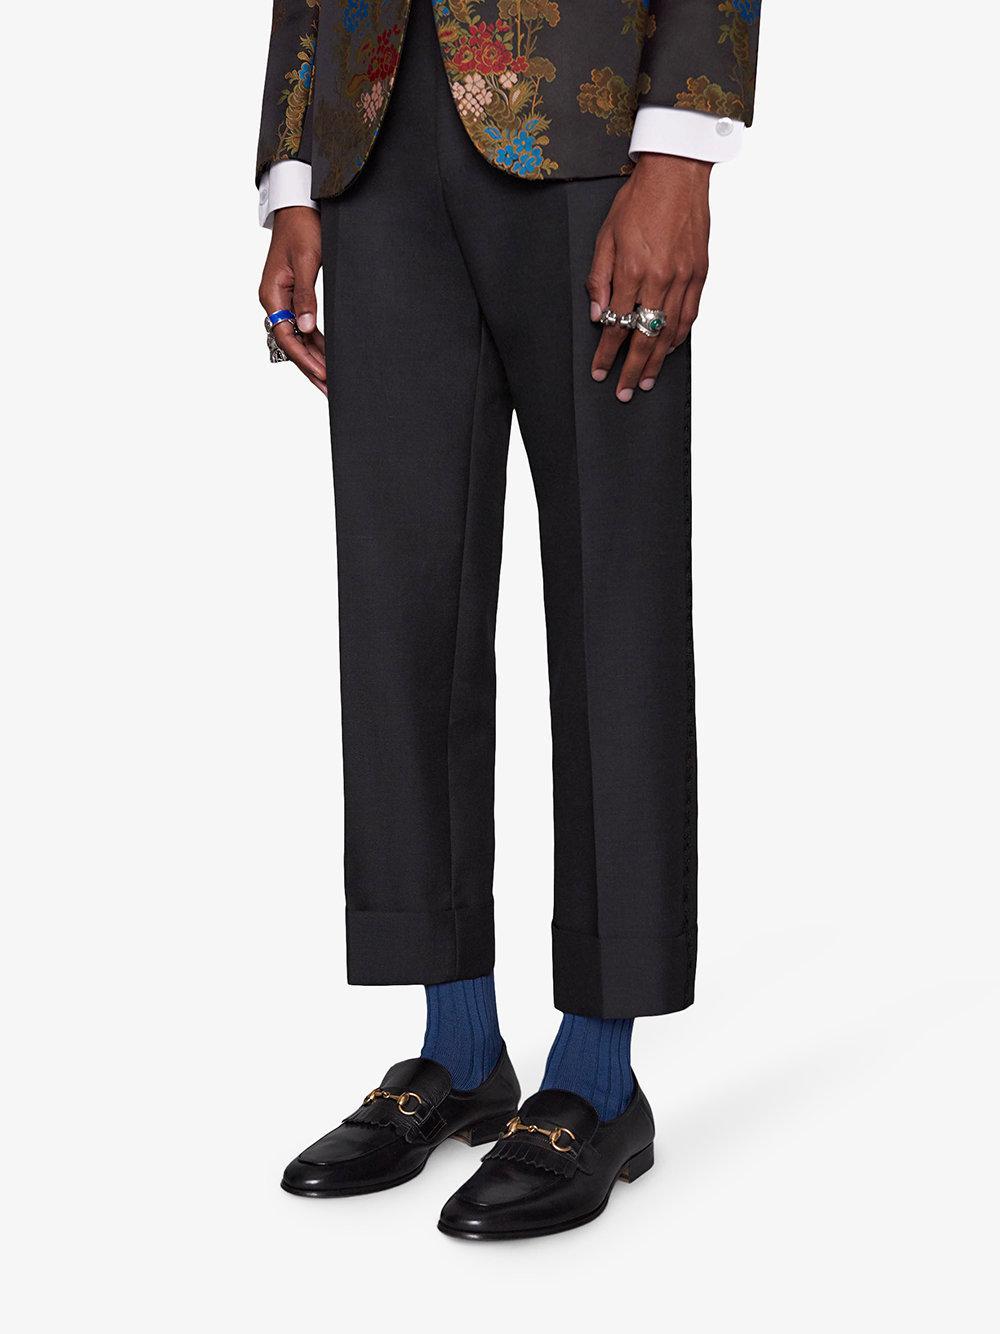 0954f2a7bb5 Gucci Leather Fringe Horsebit Loafer in Black for Men - Lyst